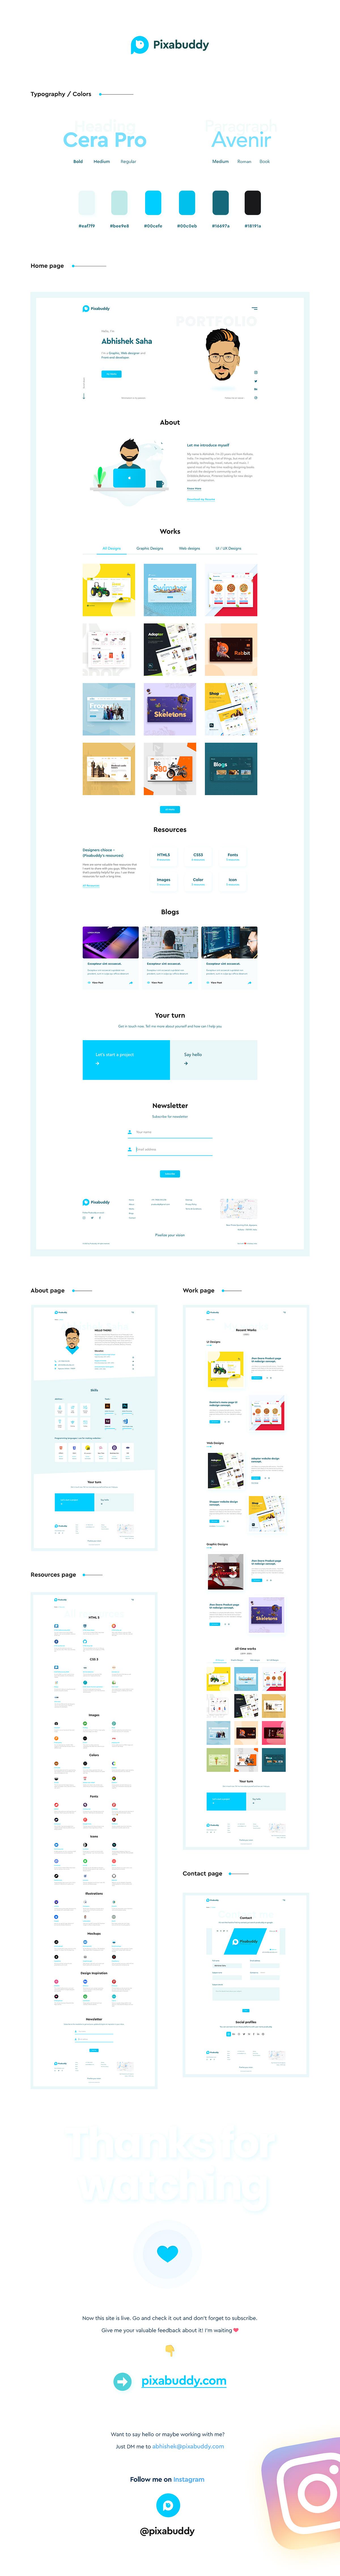 designer designs graphics Logo Design minimal design ui design UX design web app web development  Website Design